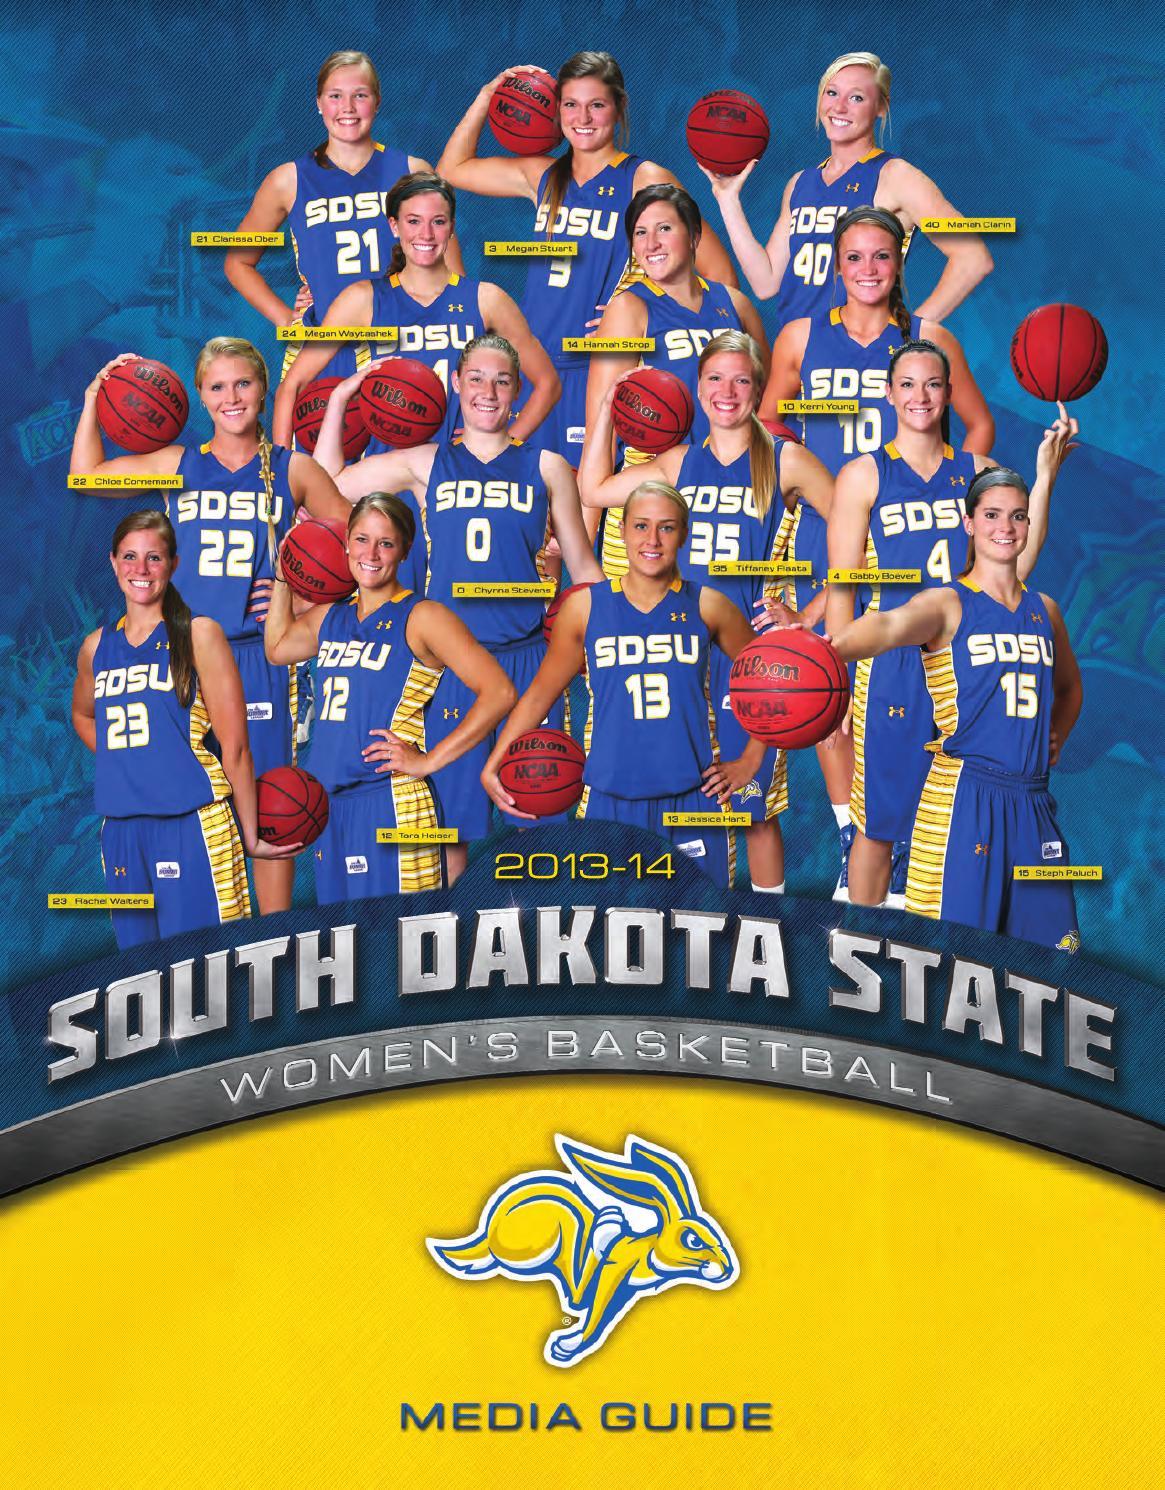 Wbb media guide 13 14 by South Dakota State University ...